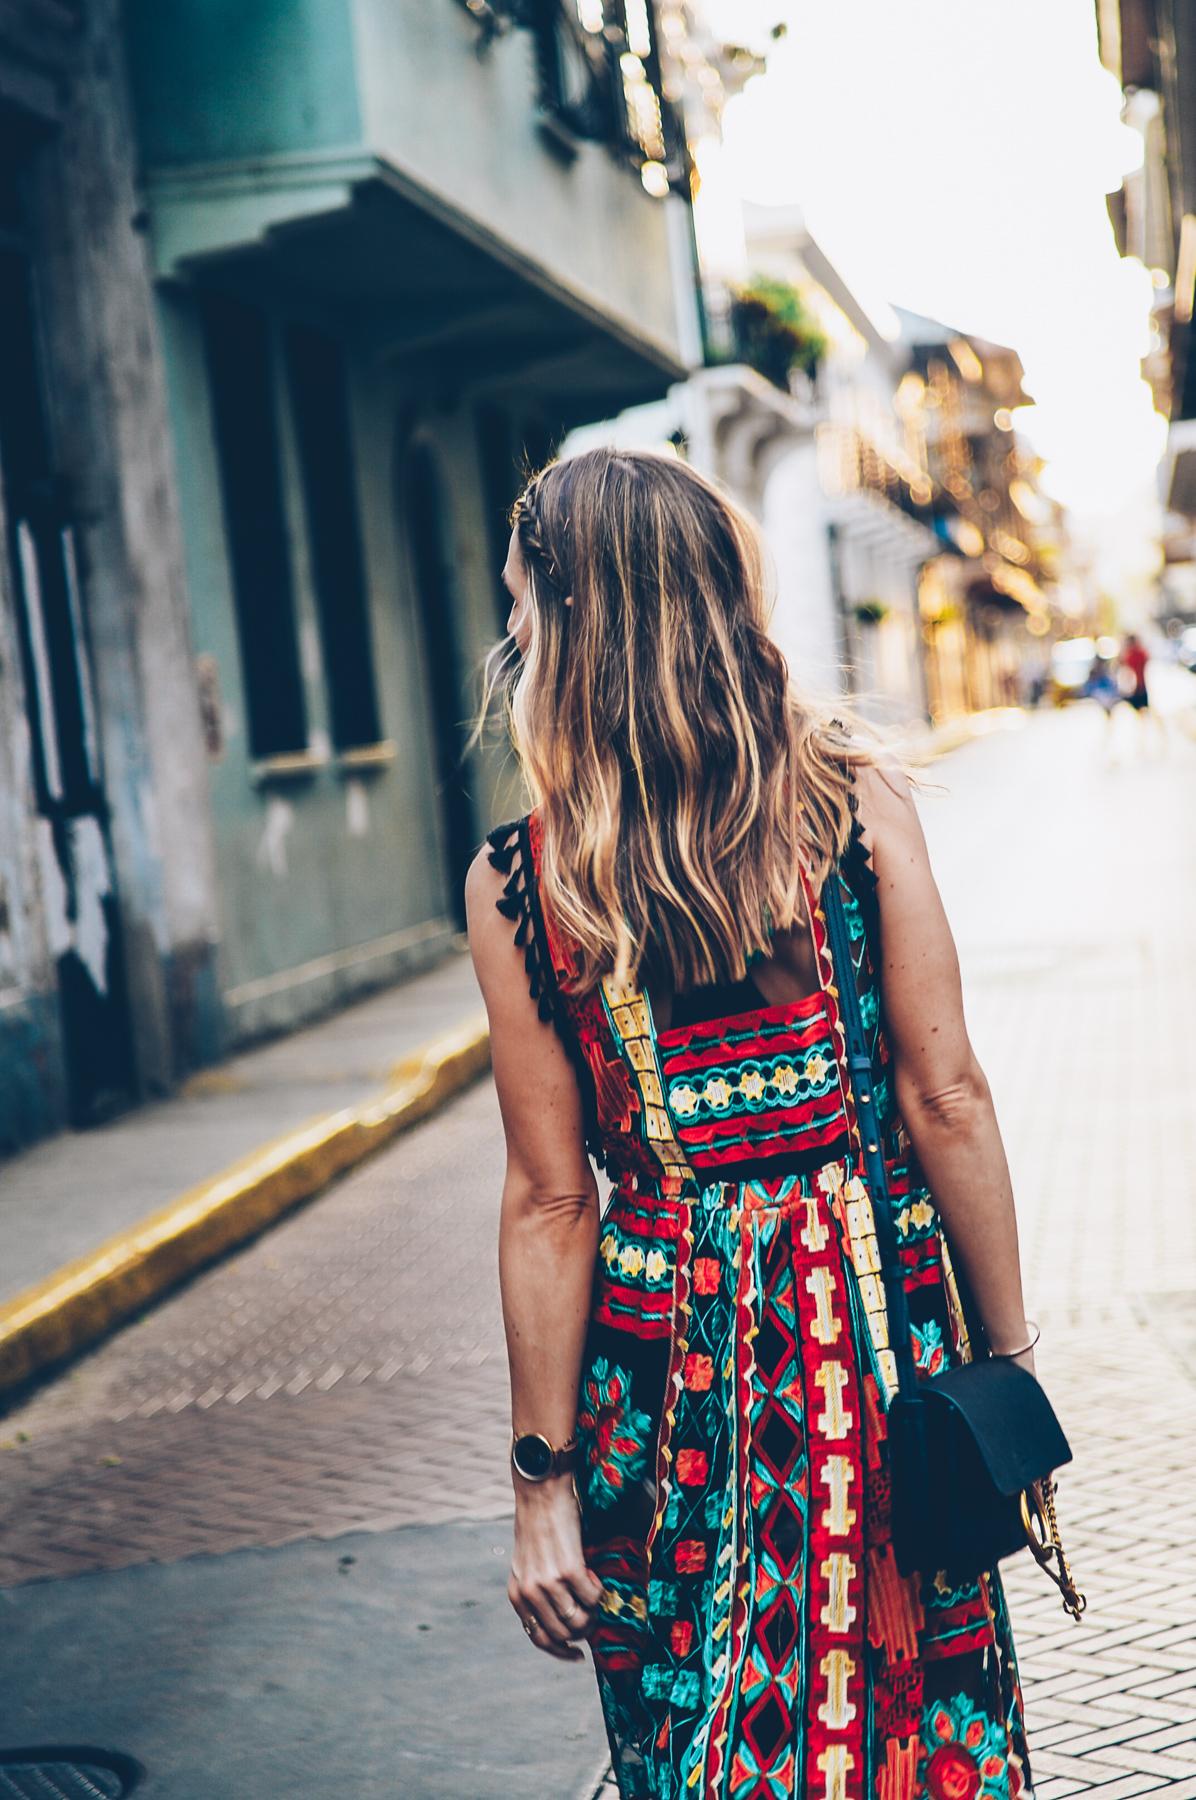 Eva Franco Saskia Embroidered Dress from Anthropologie on Jess Ann Kirby in Panama